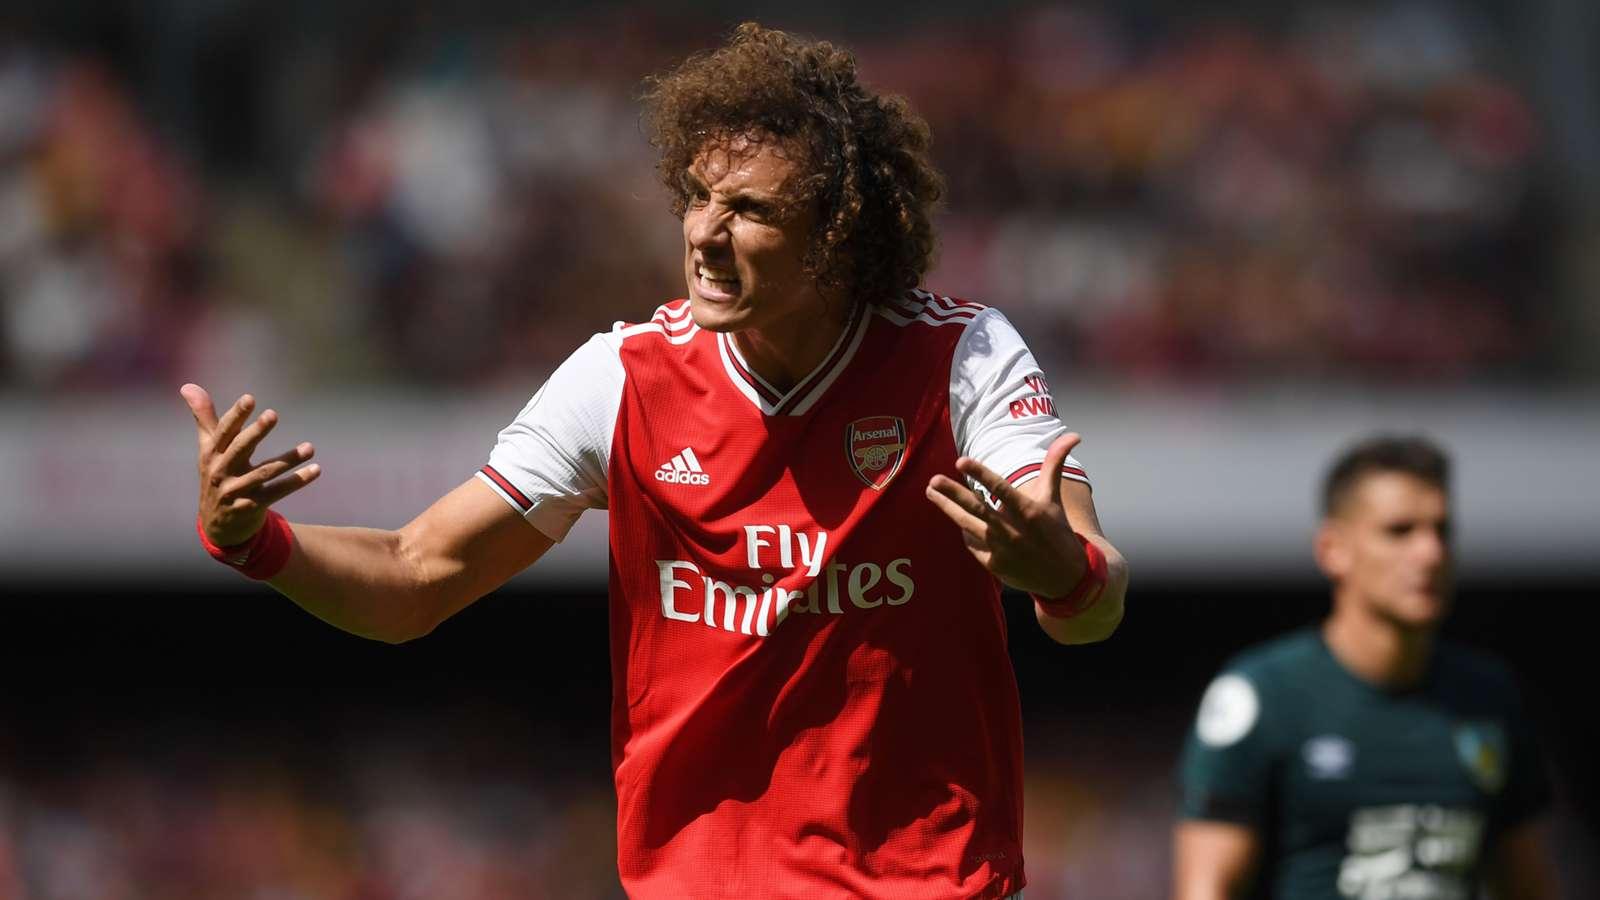 آرسنال-لیگ برتر-انگلیس-برزیل-Brazil-England-Premier League-Arsenal